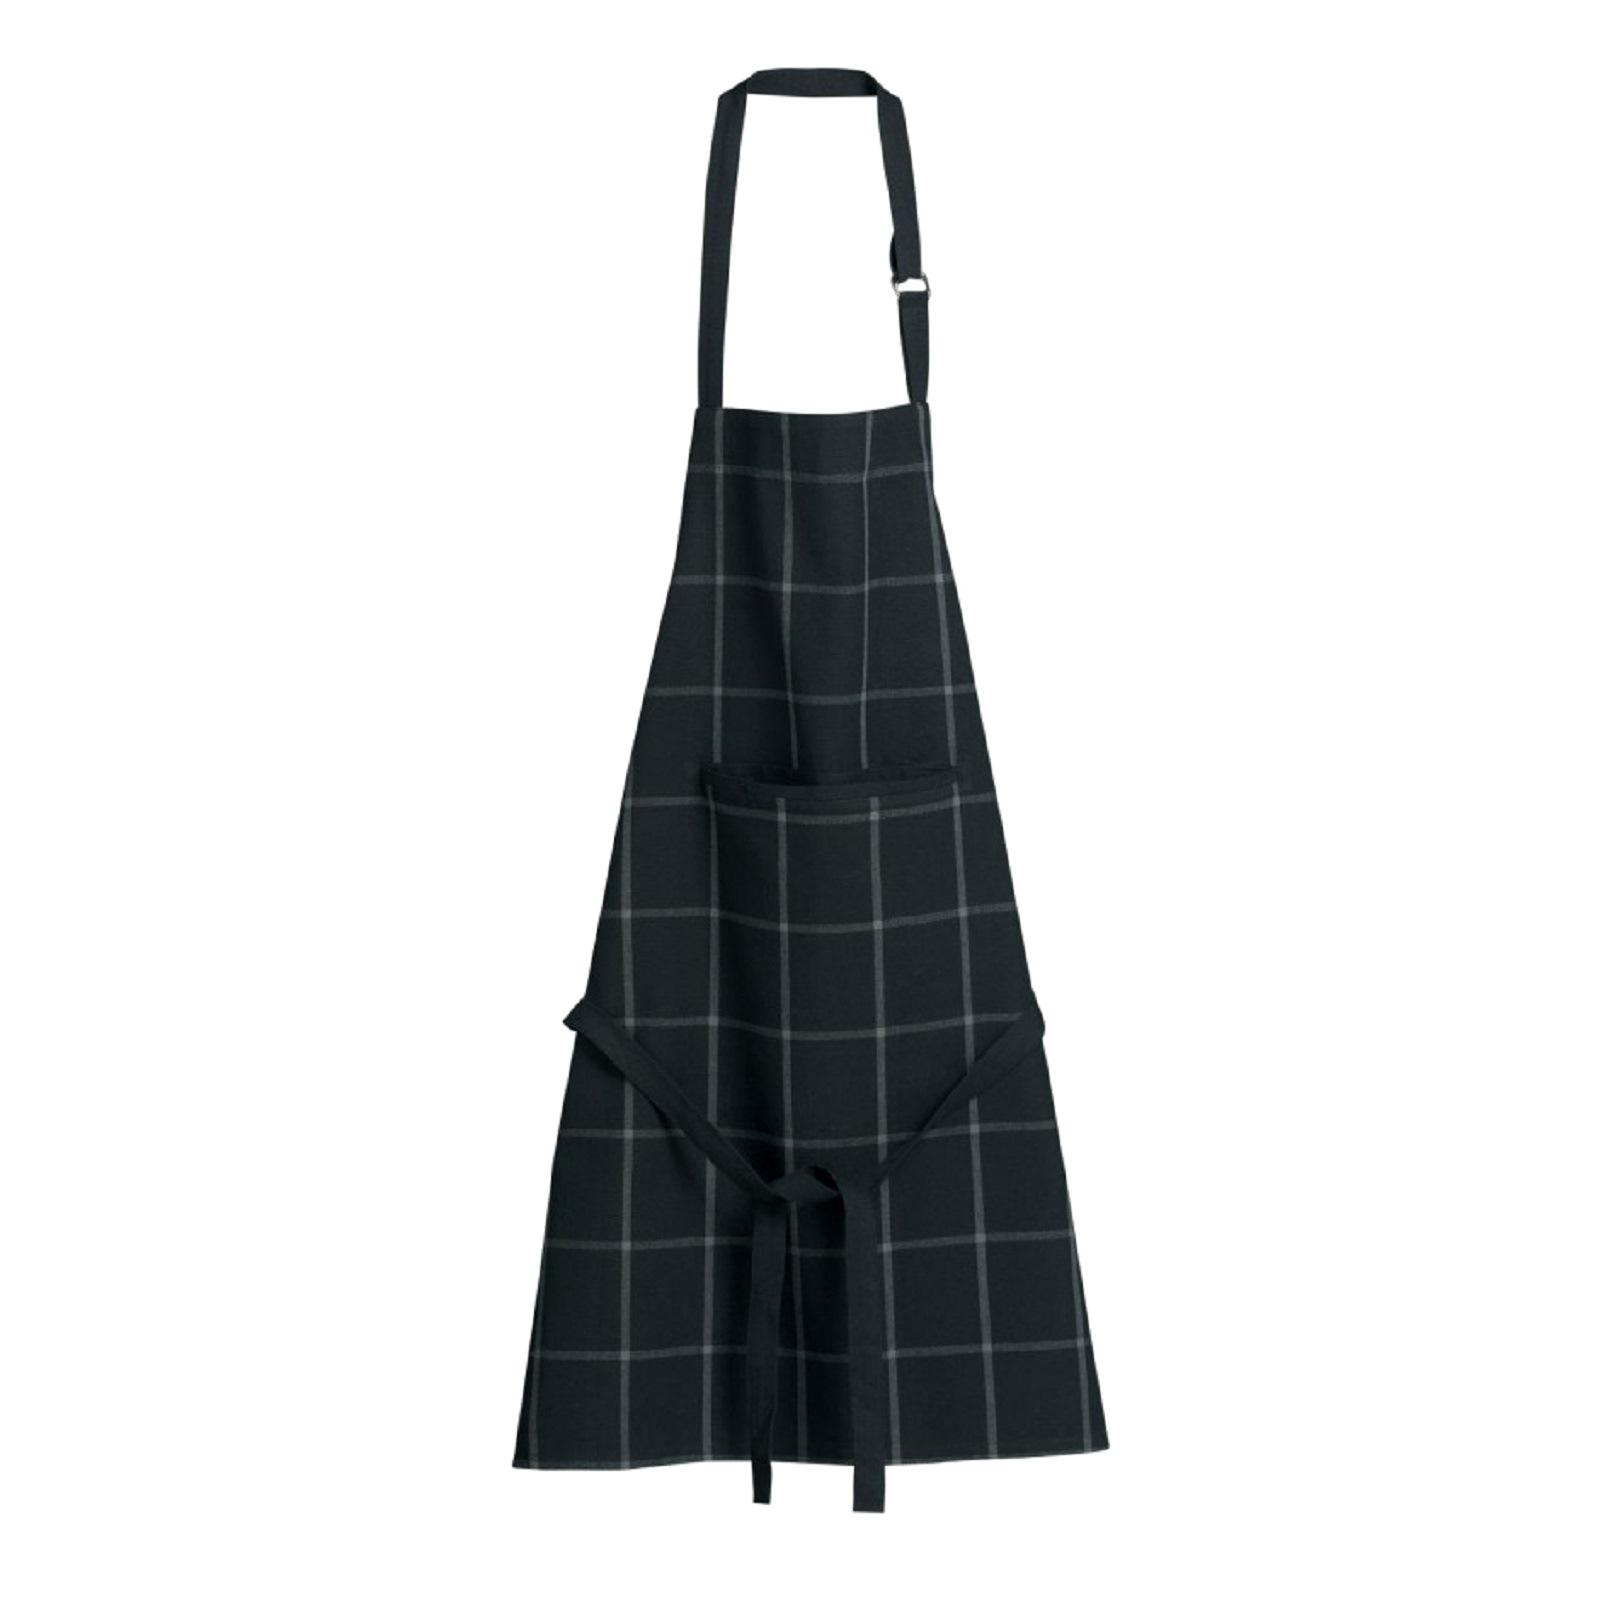 Онлайн каталог PROMENU: Фартук Winkler DOHA, размеры 80 х 85 см, черный  3720079000